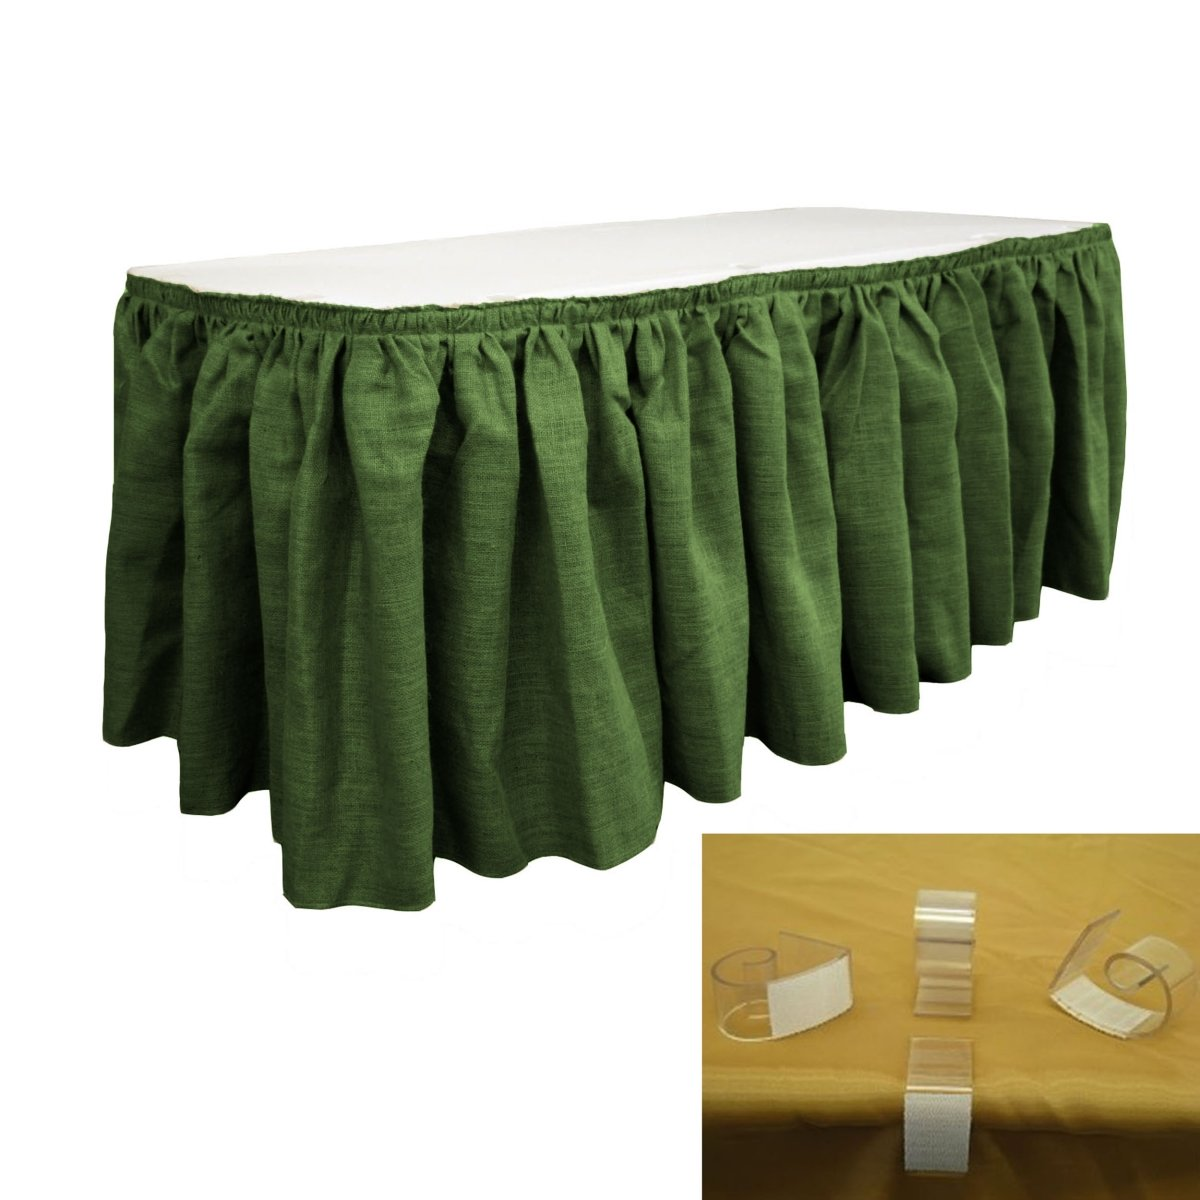 LA Linen SkirtBurlap14x29-10Lclips-GreenHunter Burlap Table Skirt with 10 L-Clips44; Hunter Green - 14 ft. x 29 in.